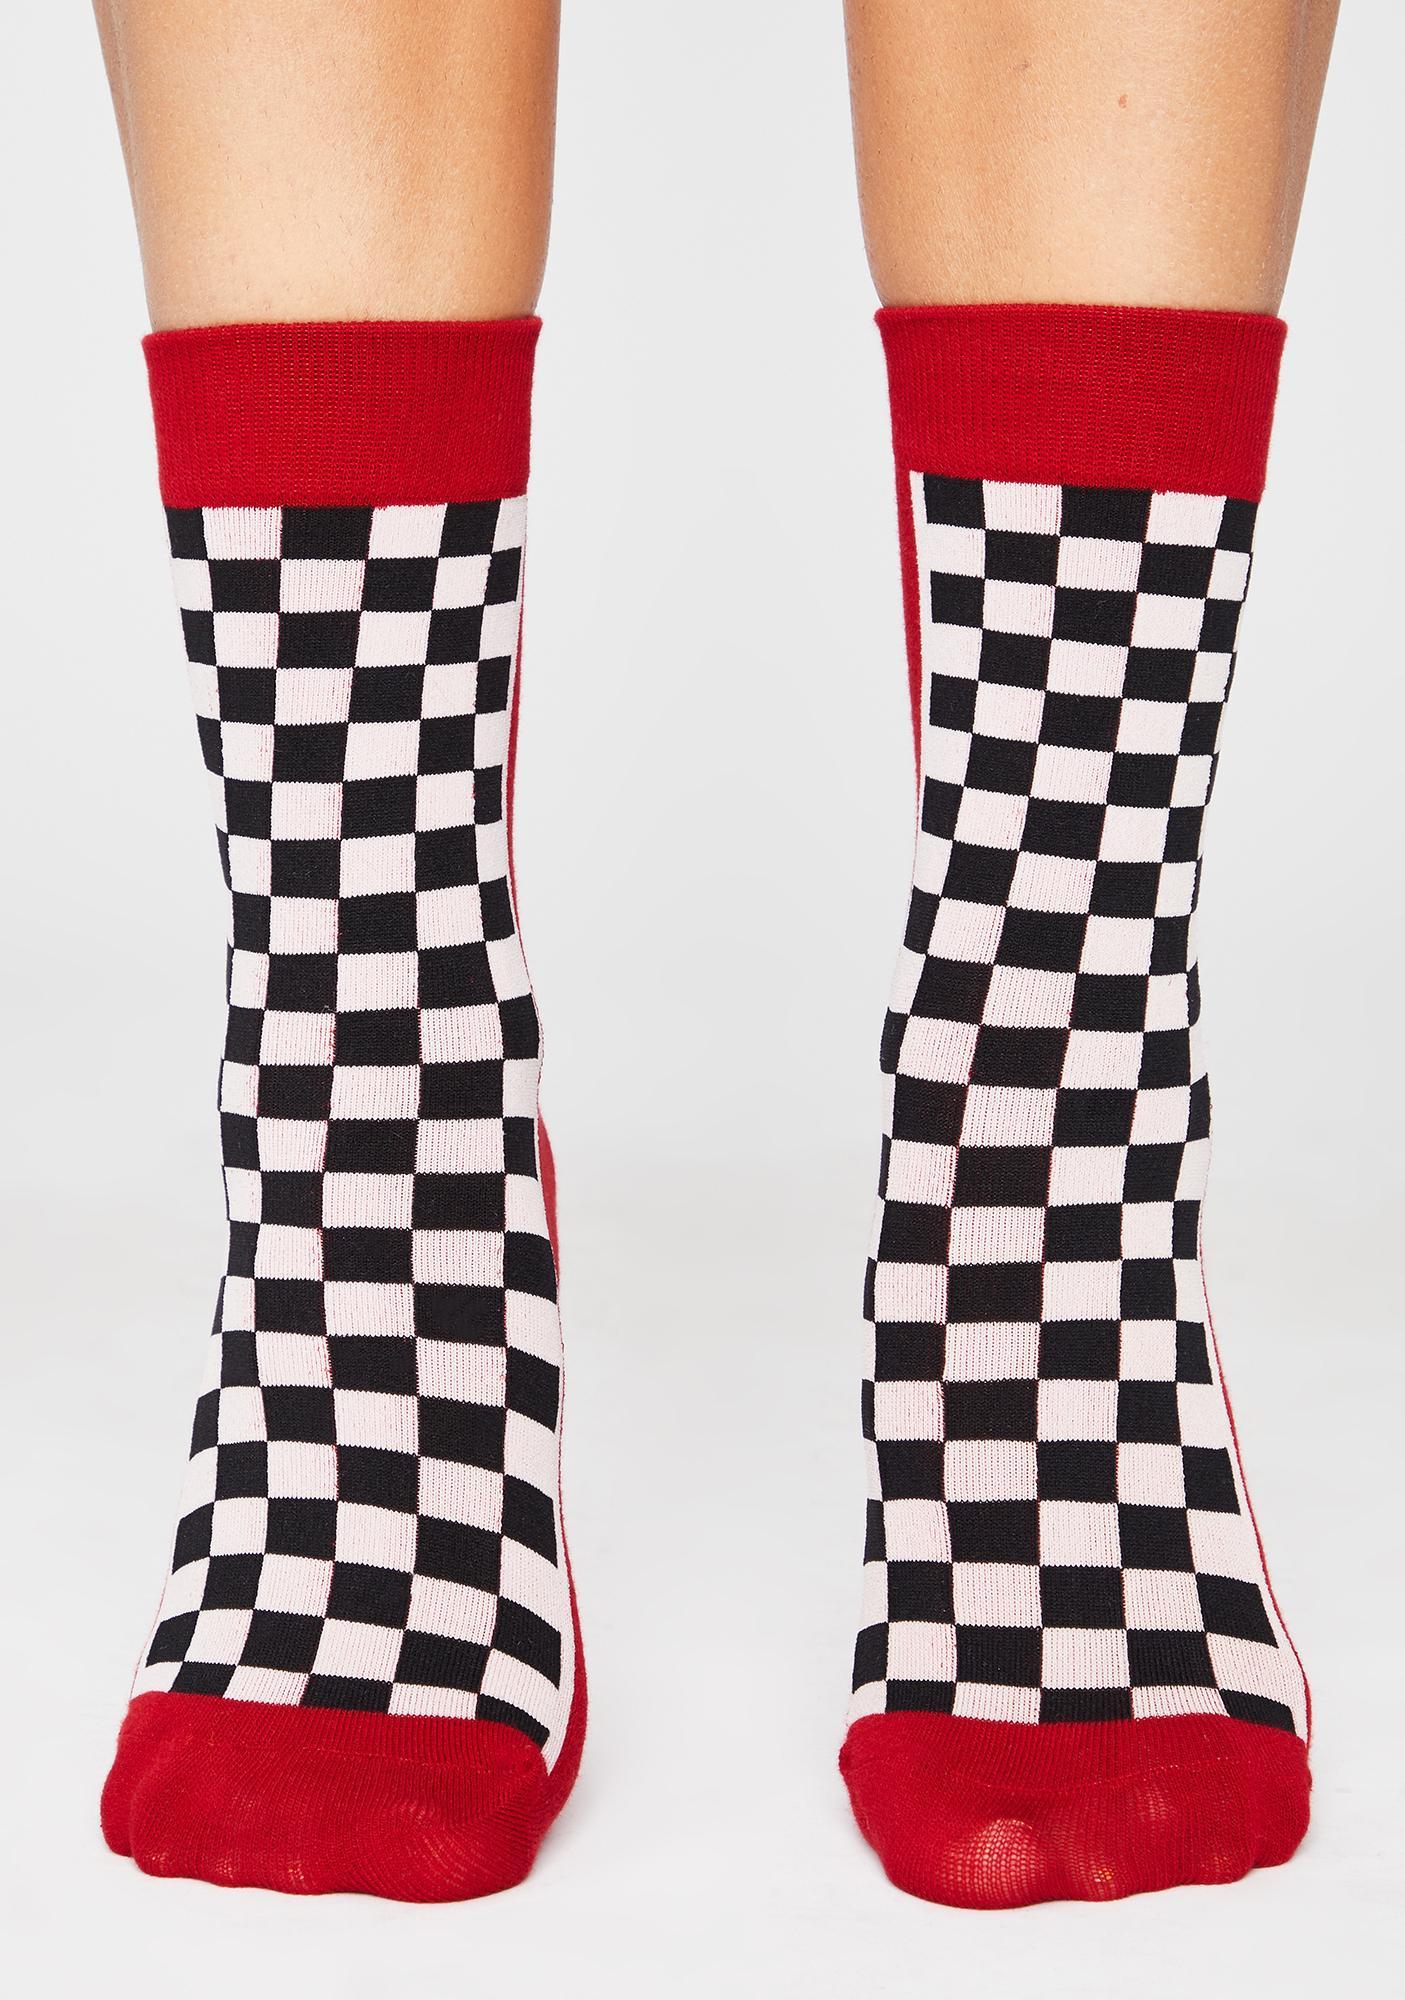 Wanna Race Checkered Crew Socks